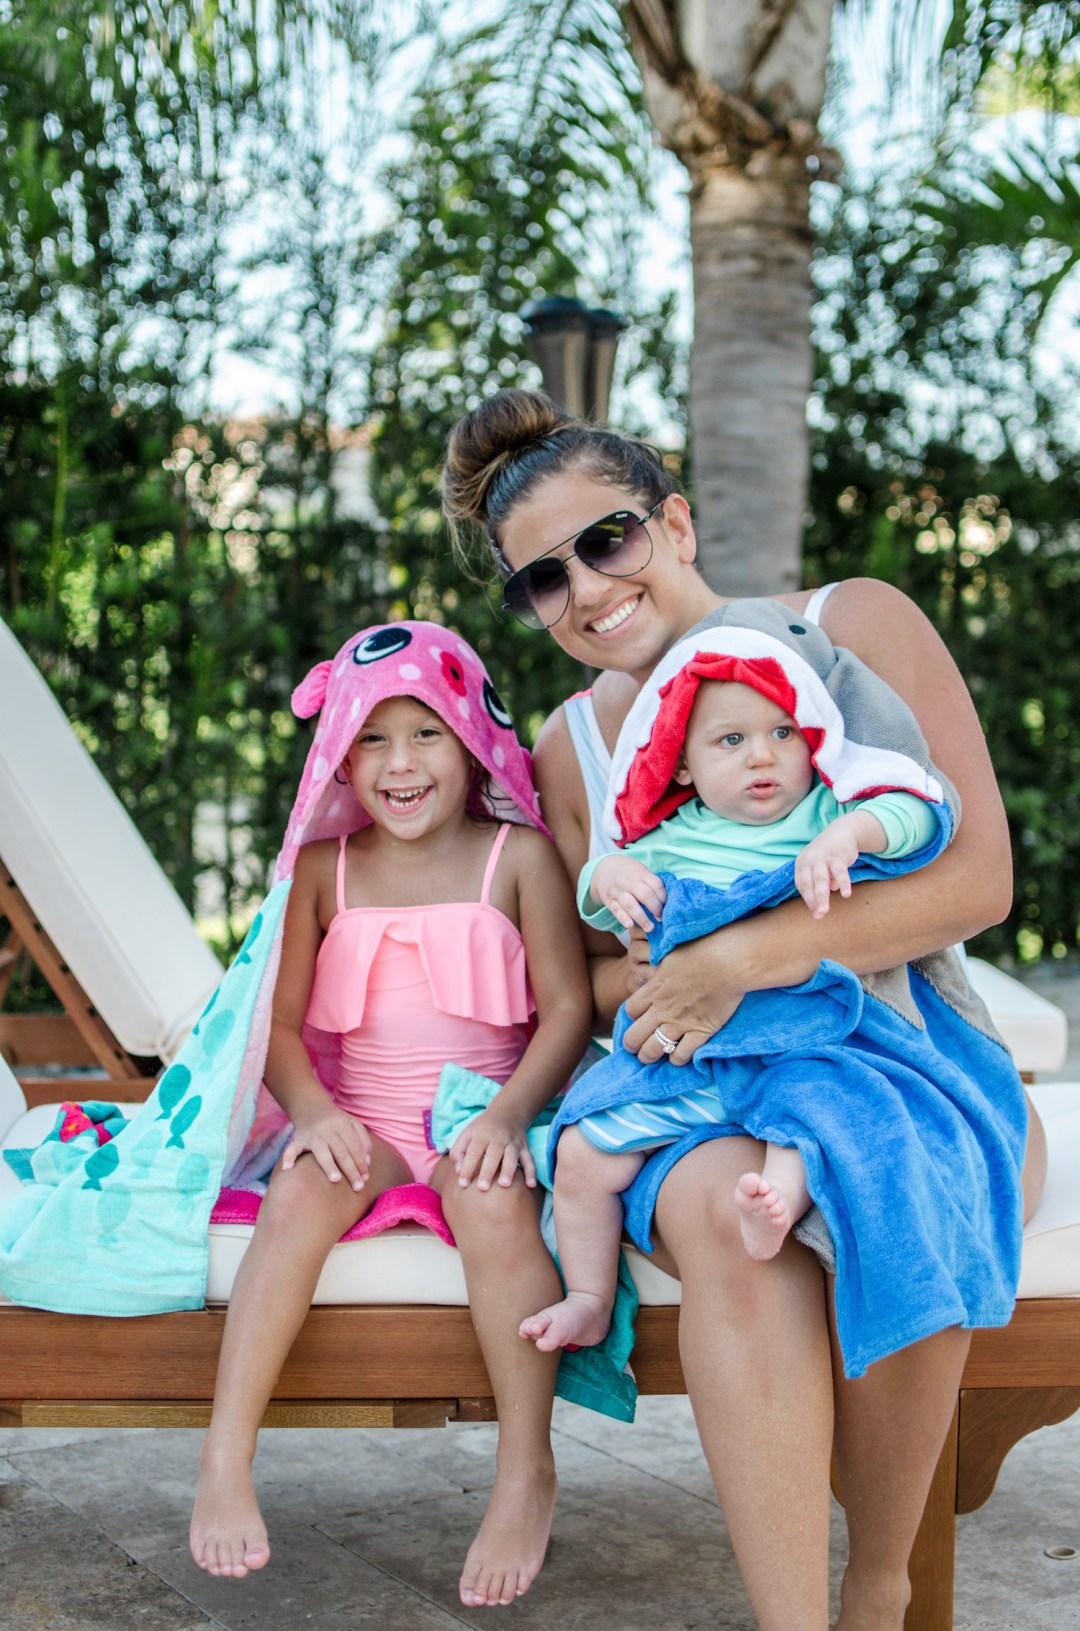 baby shark towel, hooded baby towel, hooded kids towel, Three Easy Ways to Keep Kids Safe During Pool Time